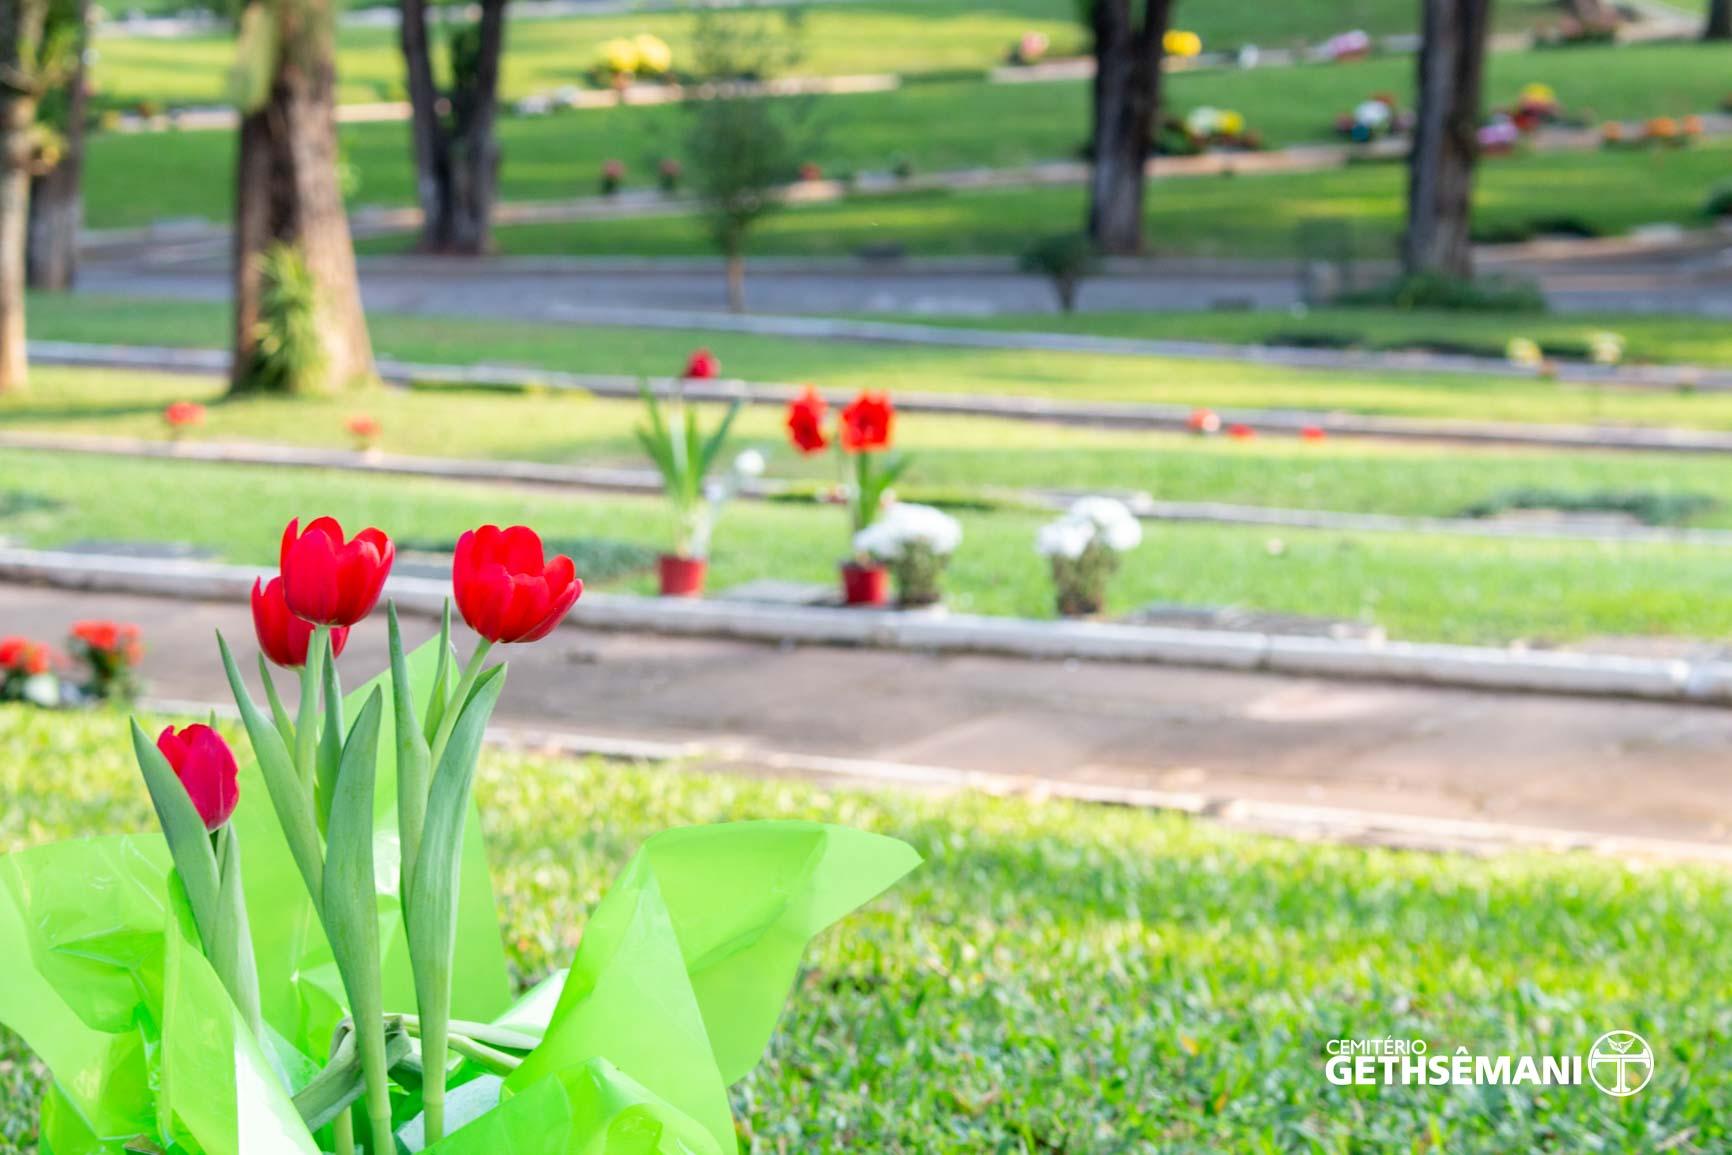 natureza-cemiterio-gethsemani (15)